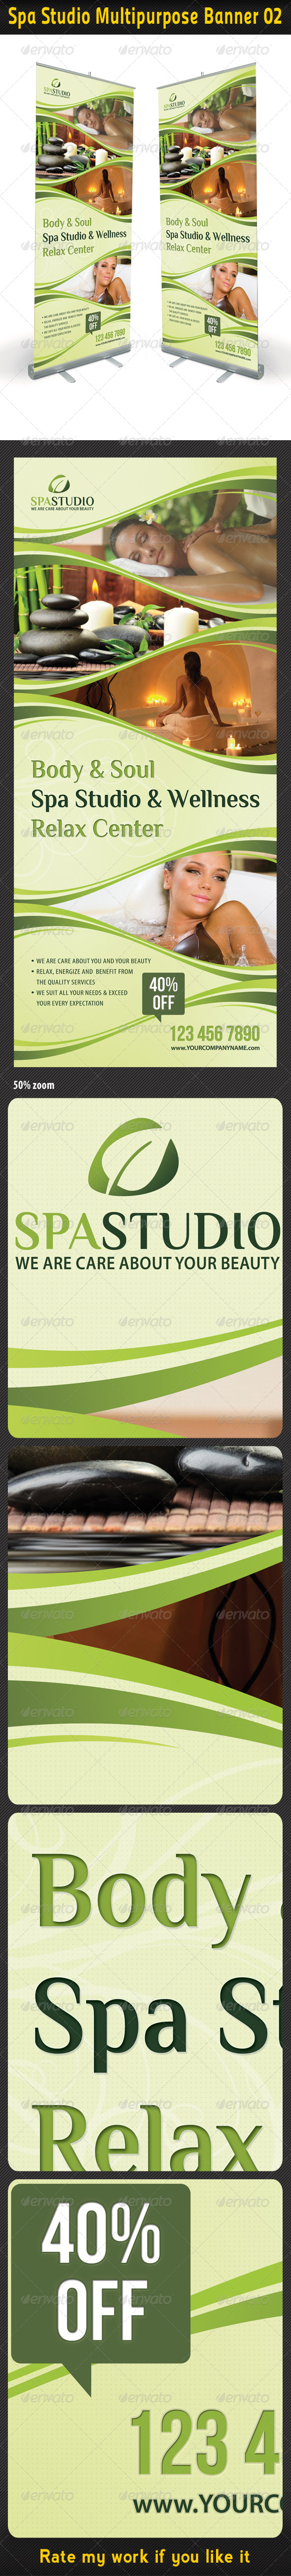 Spa Studio Multipurpose Banner 02 - Signage Print Templates